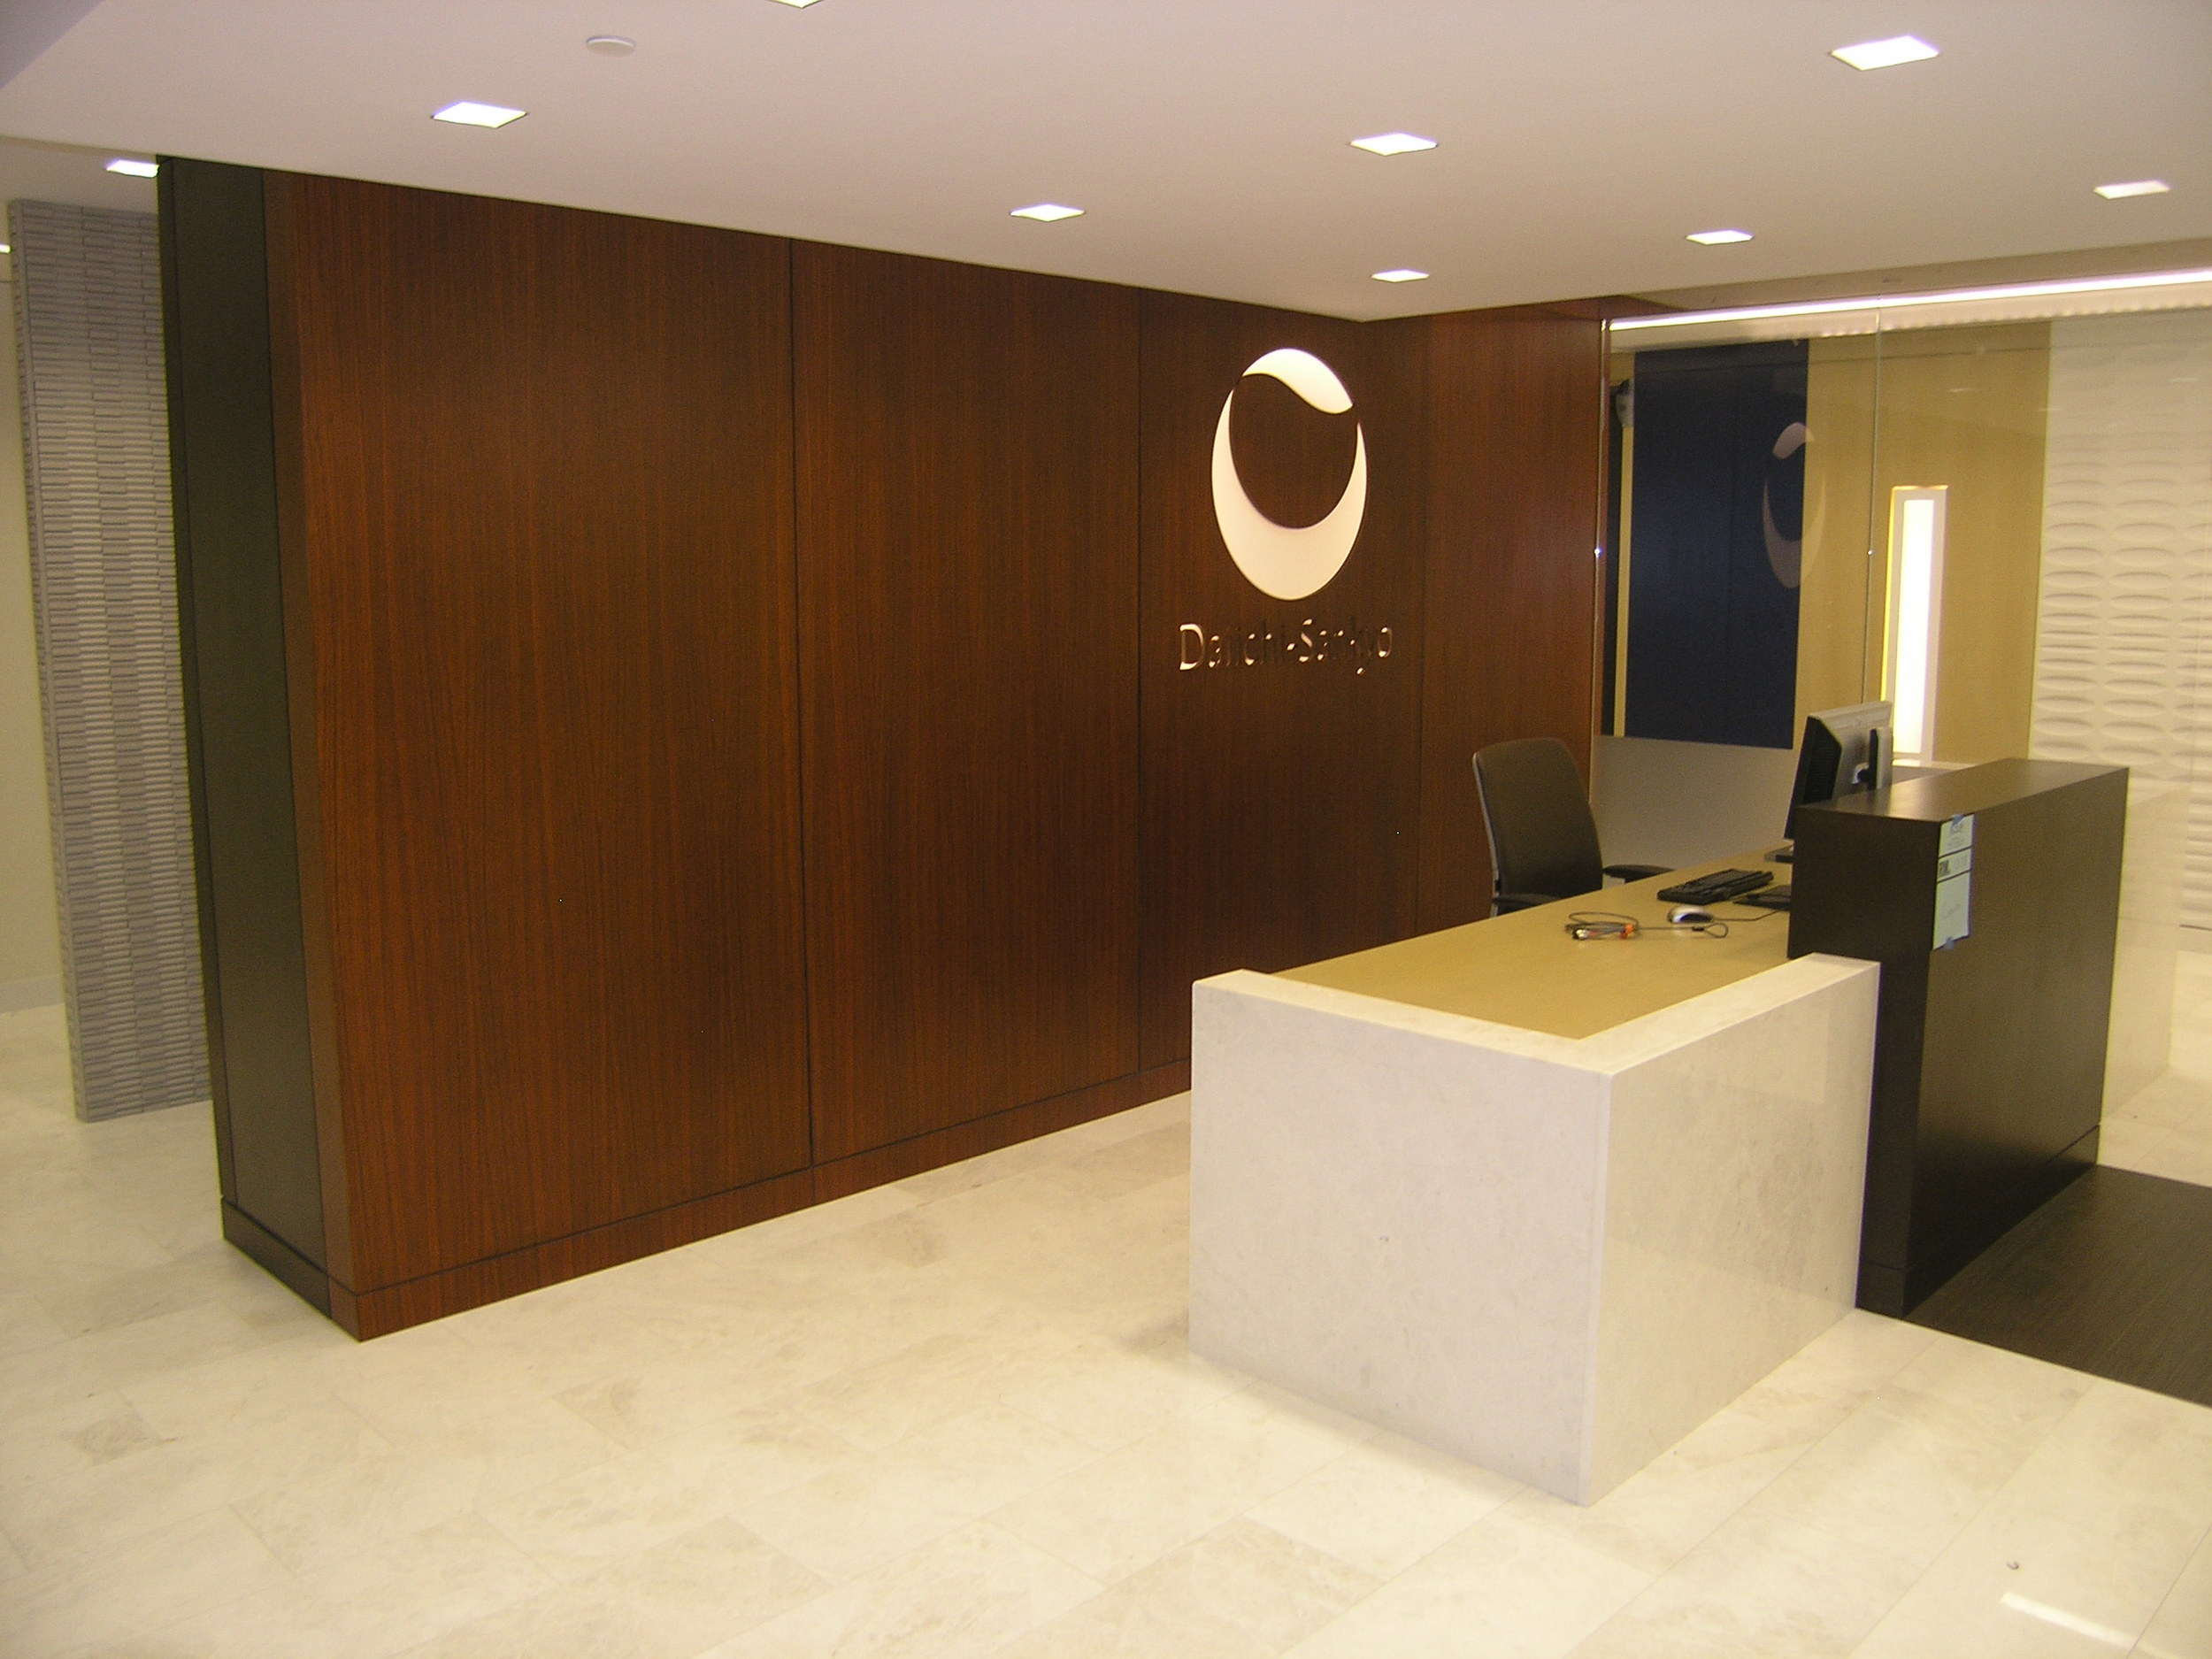 m_projects_0- Old Jobs_Daiichi Sankyo_DAIICHI SANKIO JOB 15143_PIX_Final_P1260242.JPG